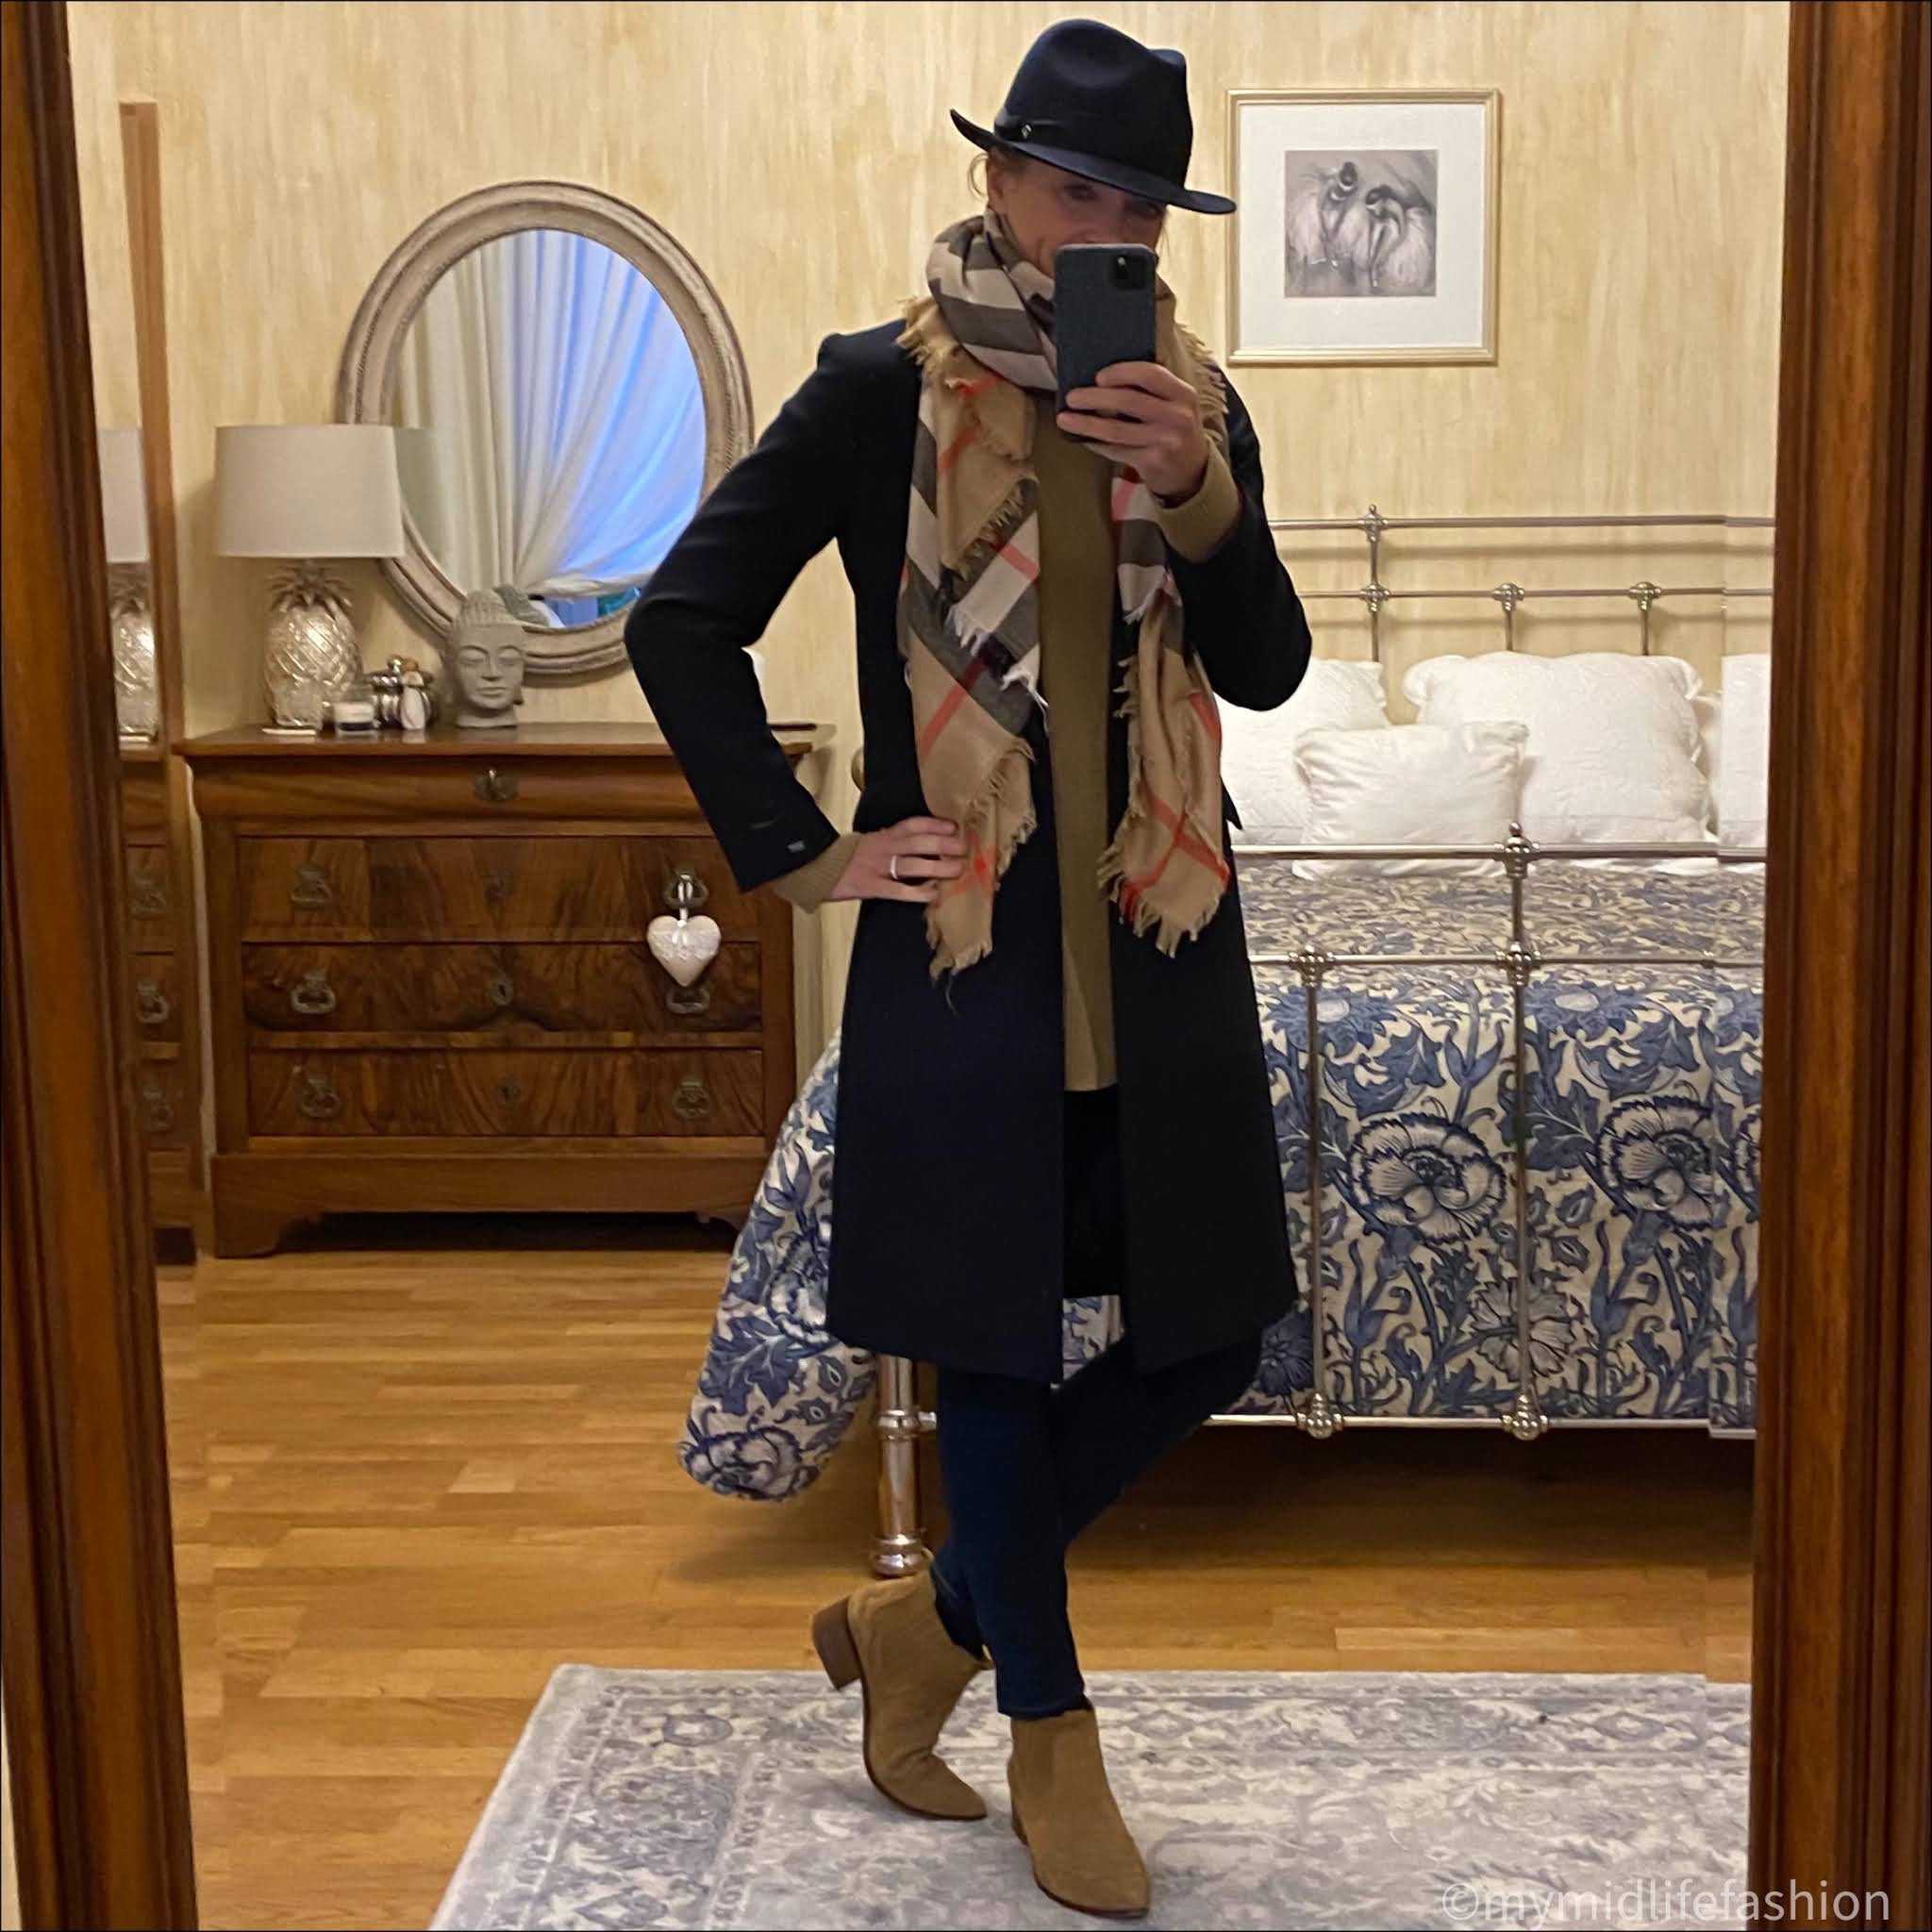 my midlife fashion, baukjen tamara jumper, felt fedora hat, Burberry oversized scarf, Tommy Hilfiger coat, j crew 8 inch toothpick skinny jeans, zara western heel cowboy ankle boots